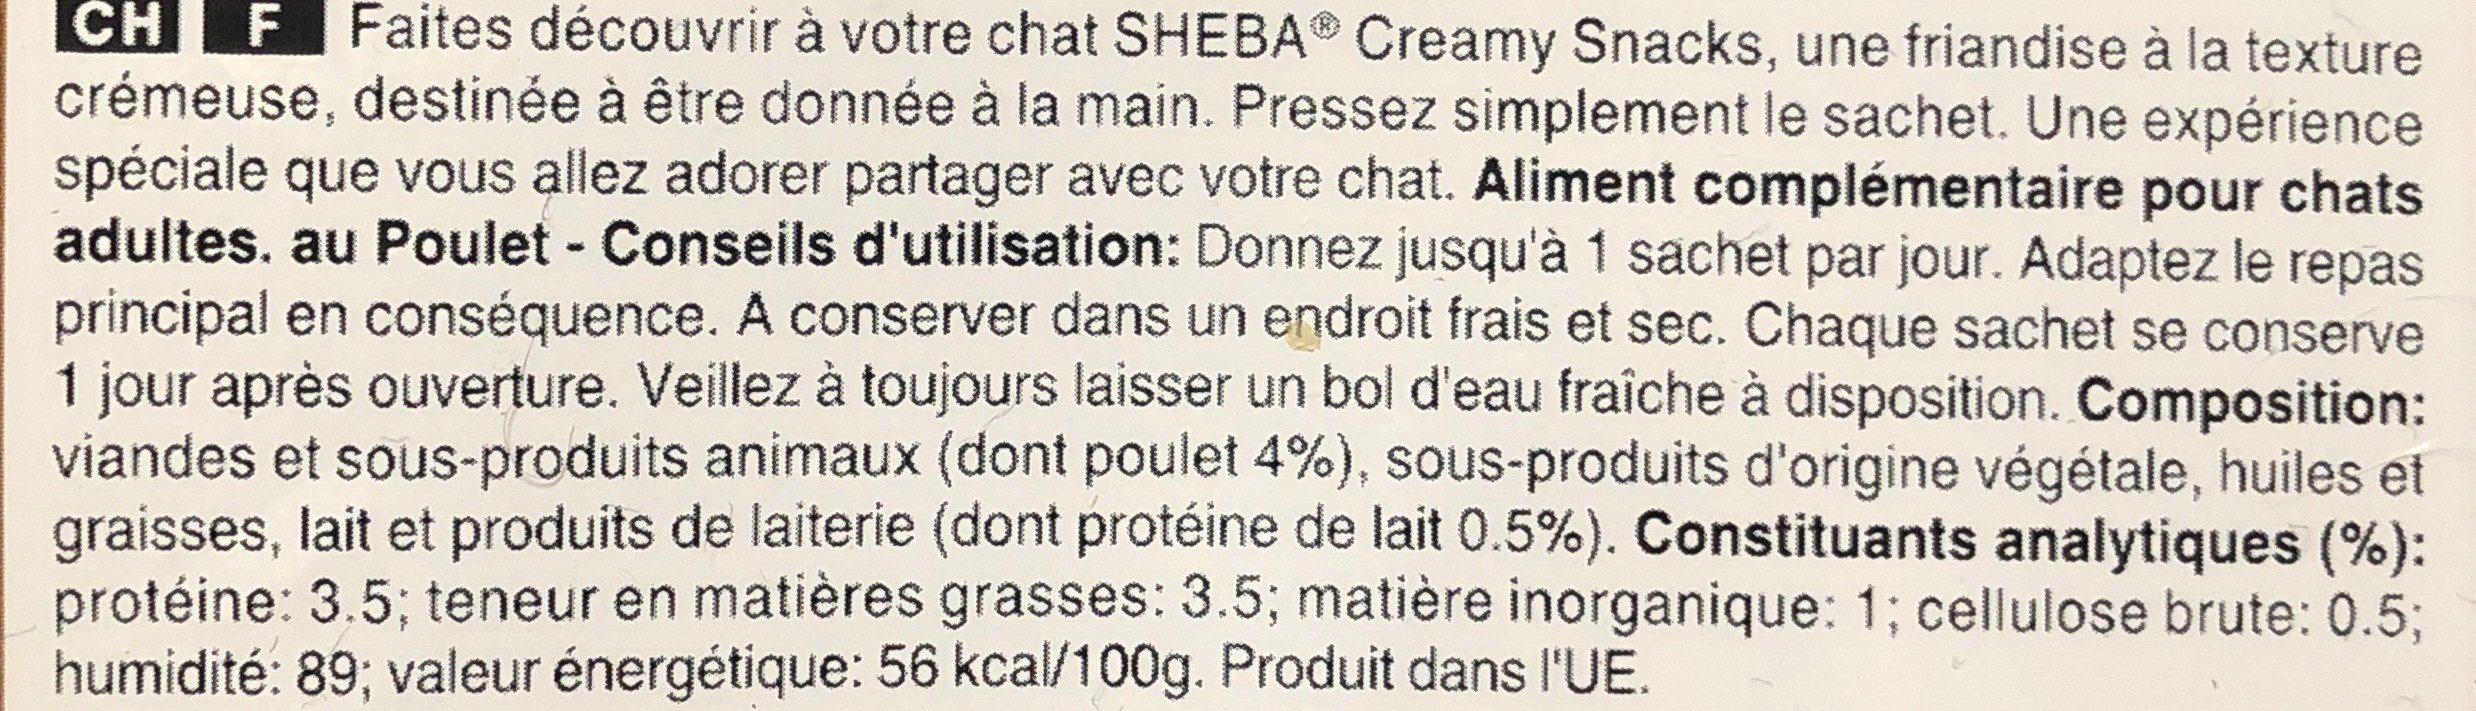 Creamy Snacks - Poulet - Ingredients - fr